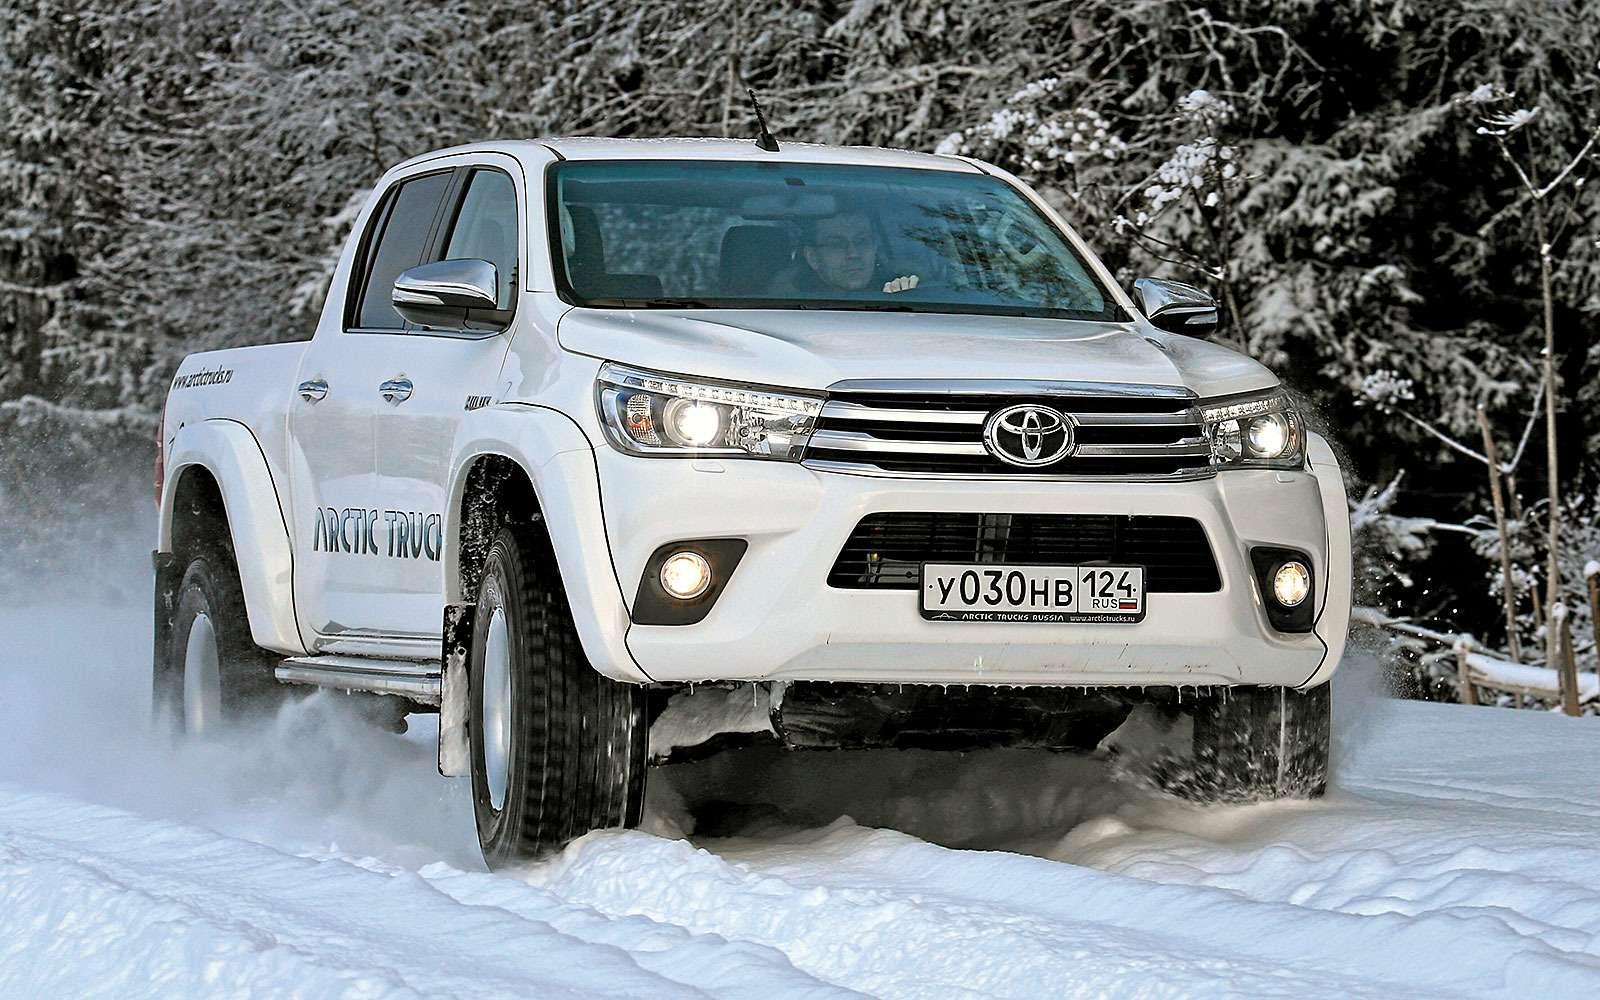 Toyota Hilux Arctic Trucks AT356X6